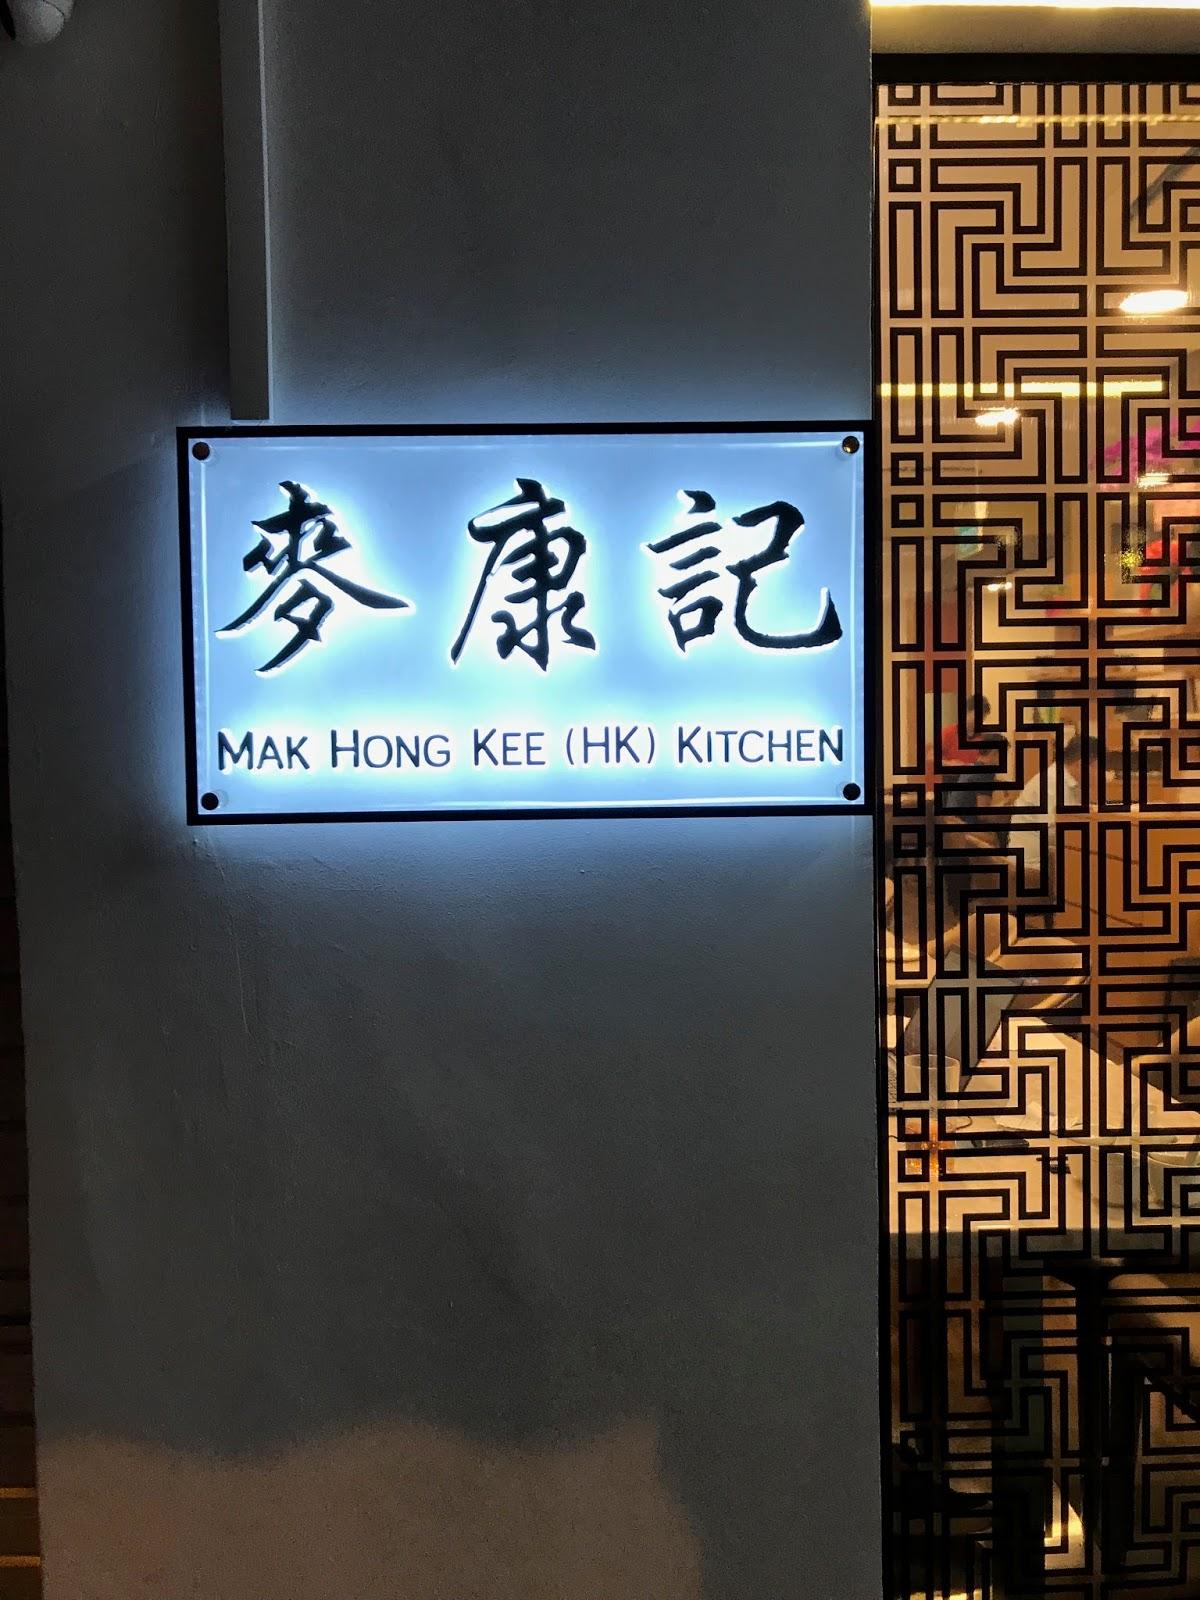 Small Potatoes Make The Steak Look Bigger: Mak Hong Kee (HK) Kitchen ...